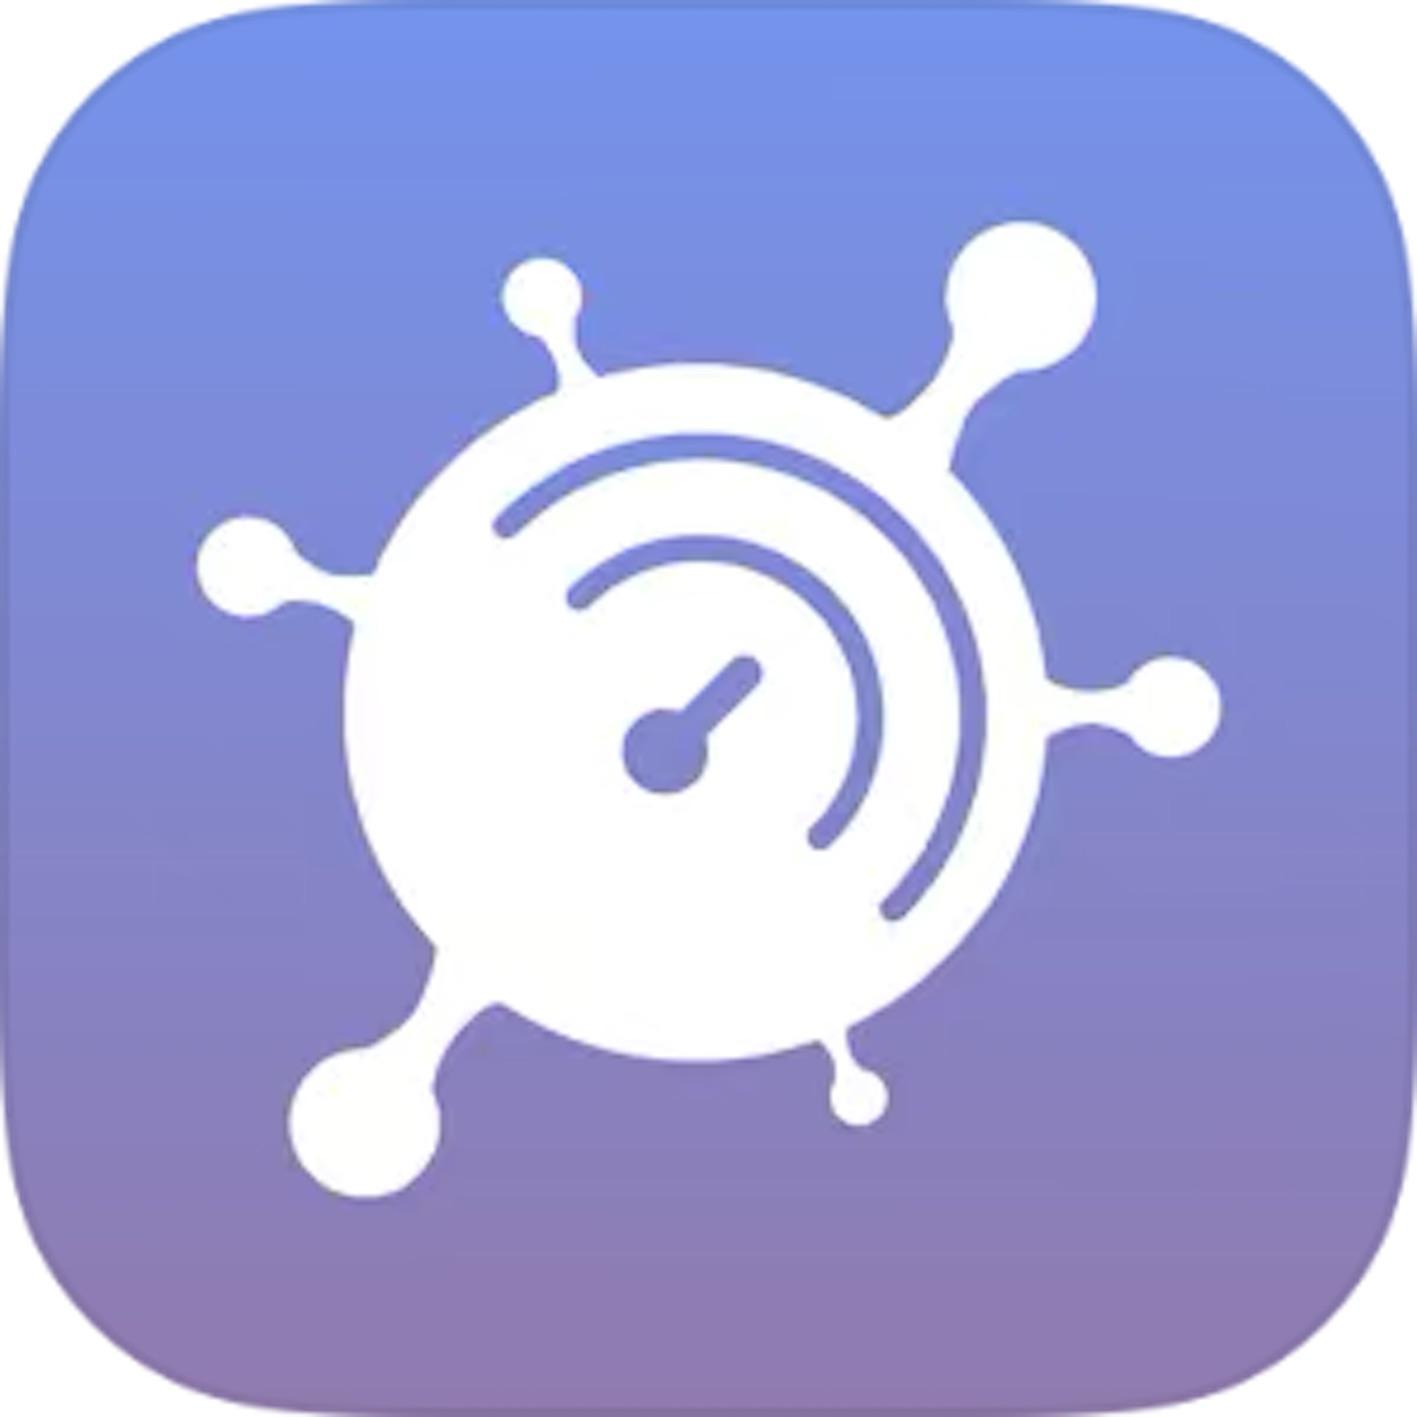 Radar Covid App Logo.